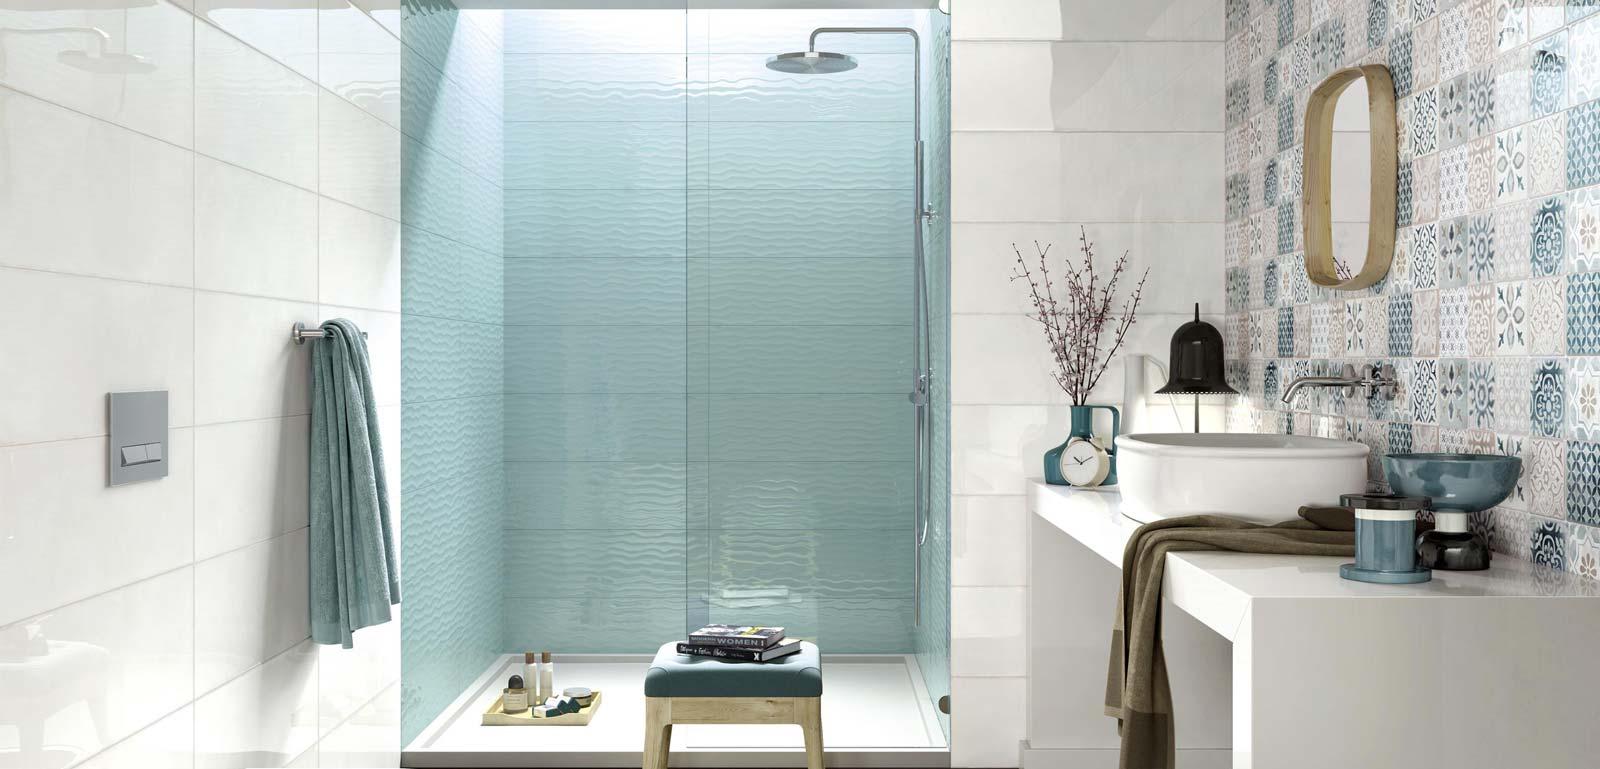 Salle De Bain Revetement revêtement mural de salle de bains moderne : frame et energy